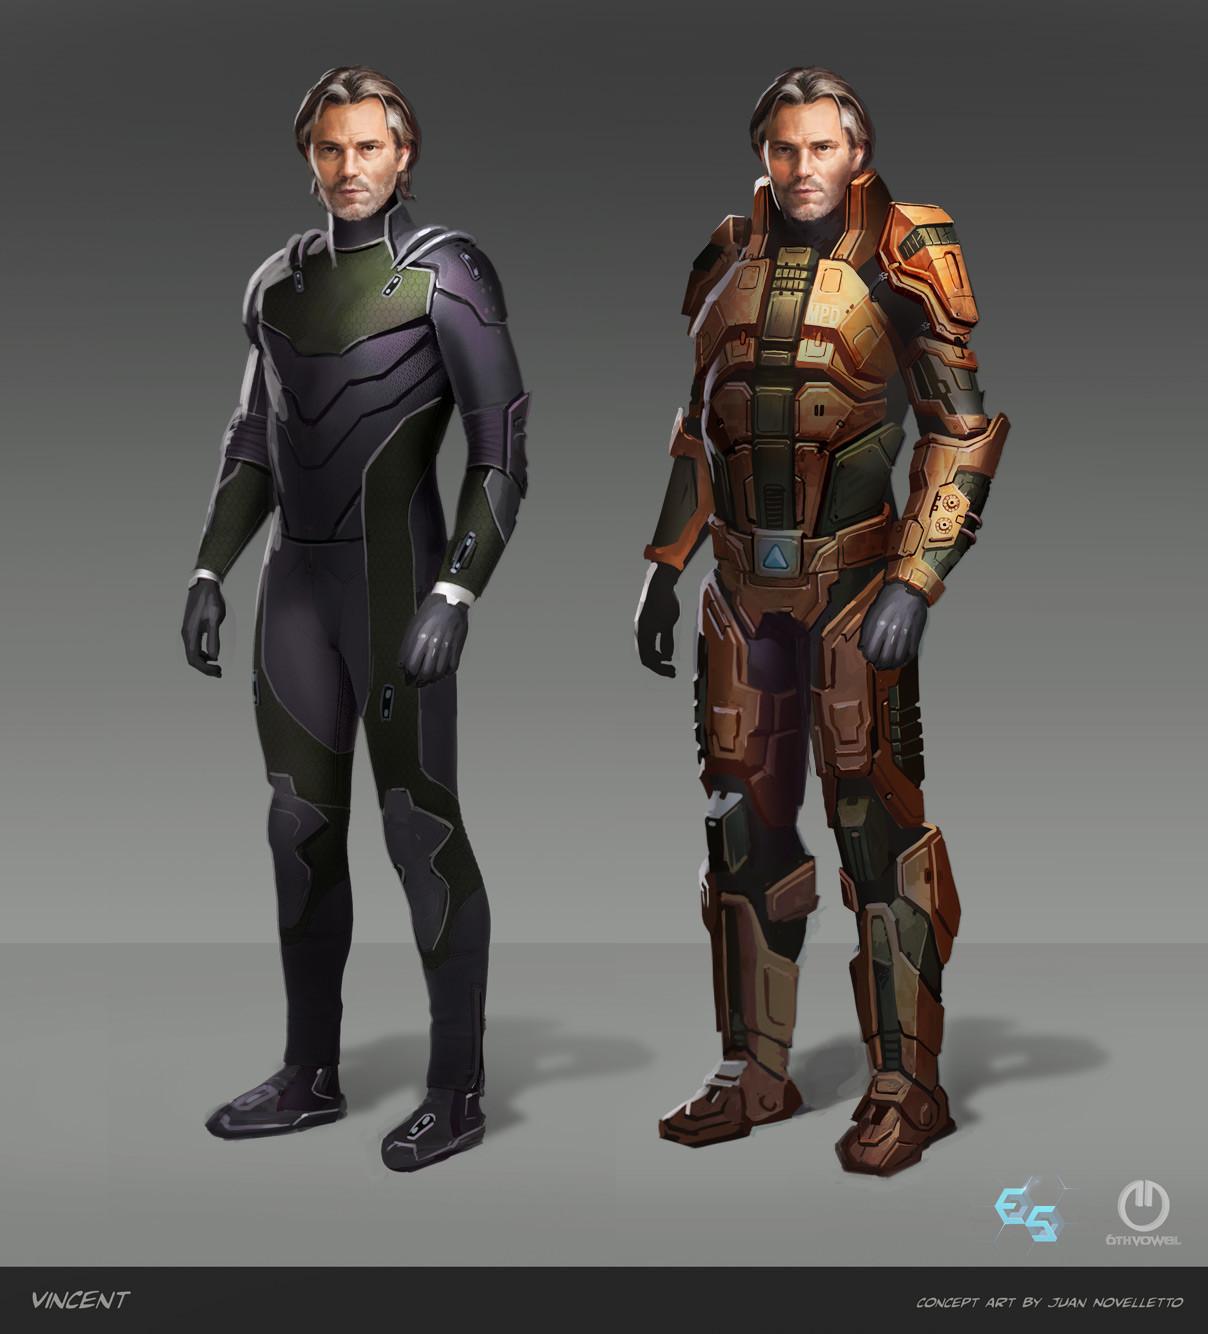 Vincent in his combat armor